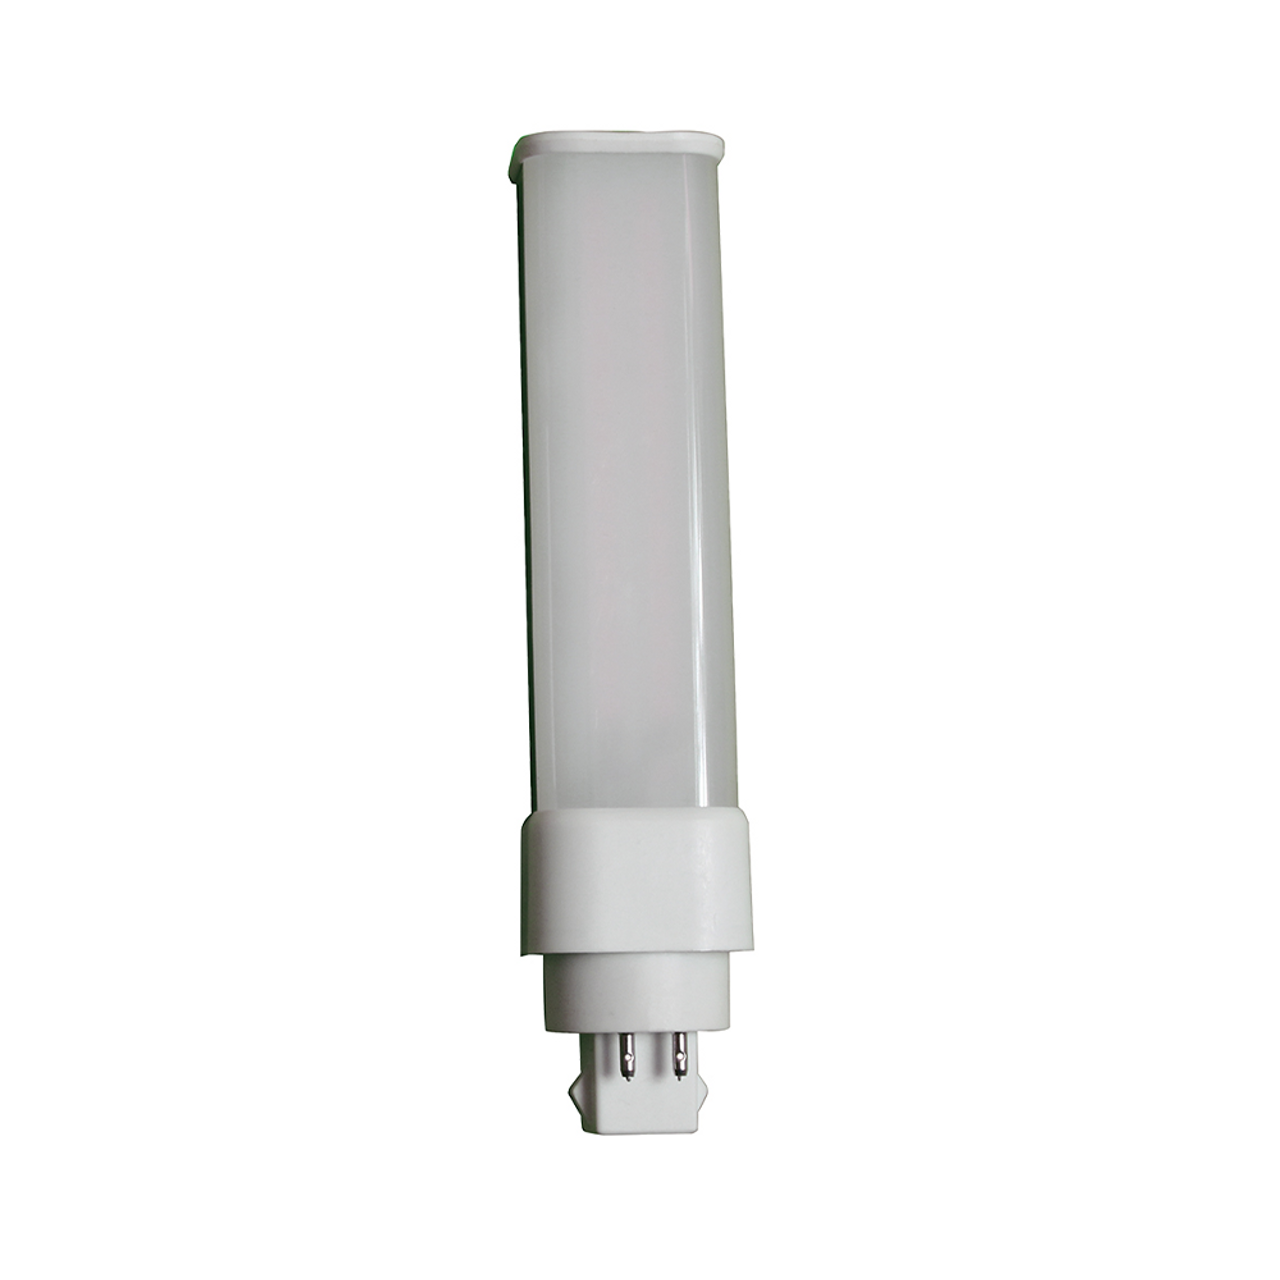 Halco 82118 12 Watt 4000k 4 Pin Led Pl Lamp Citylightsusa Com